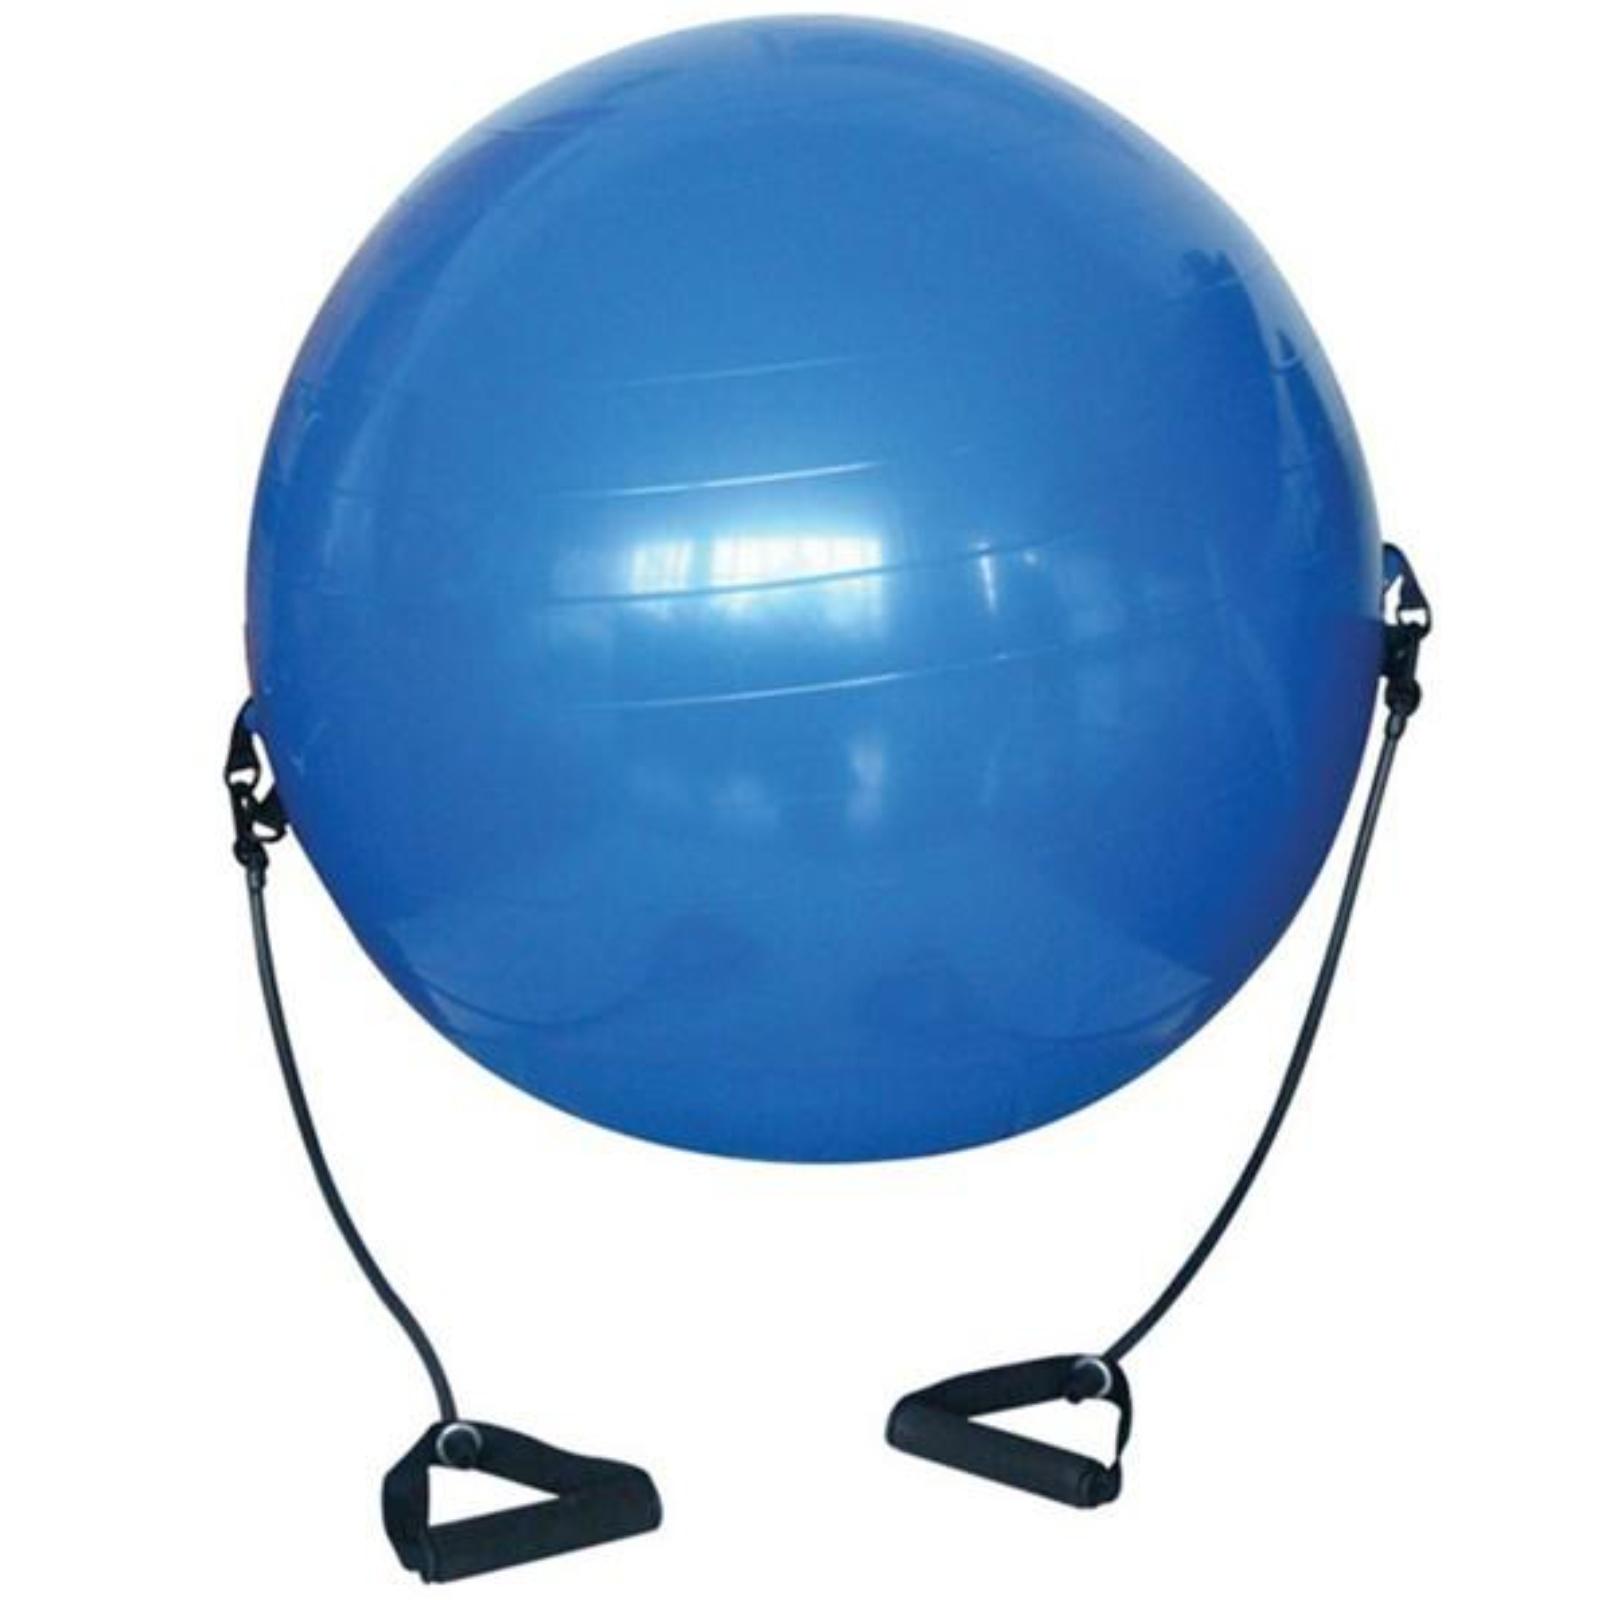 Gymnastický míč s úchyty průměr 65 cm